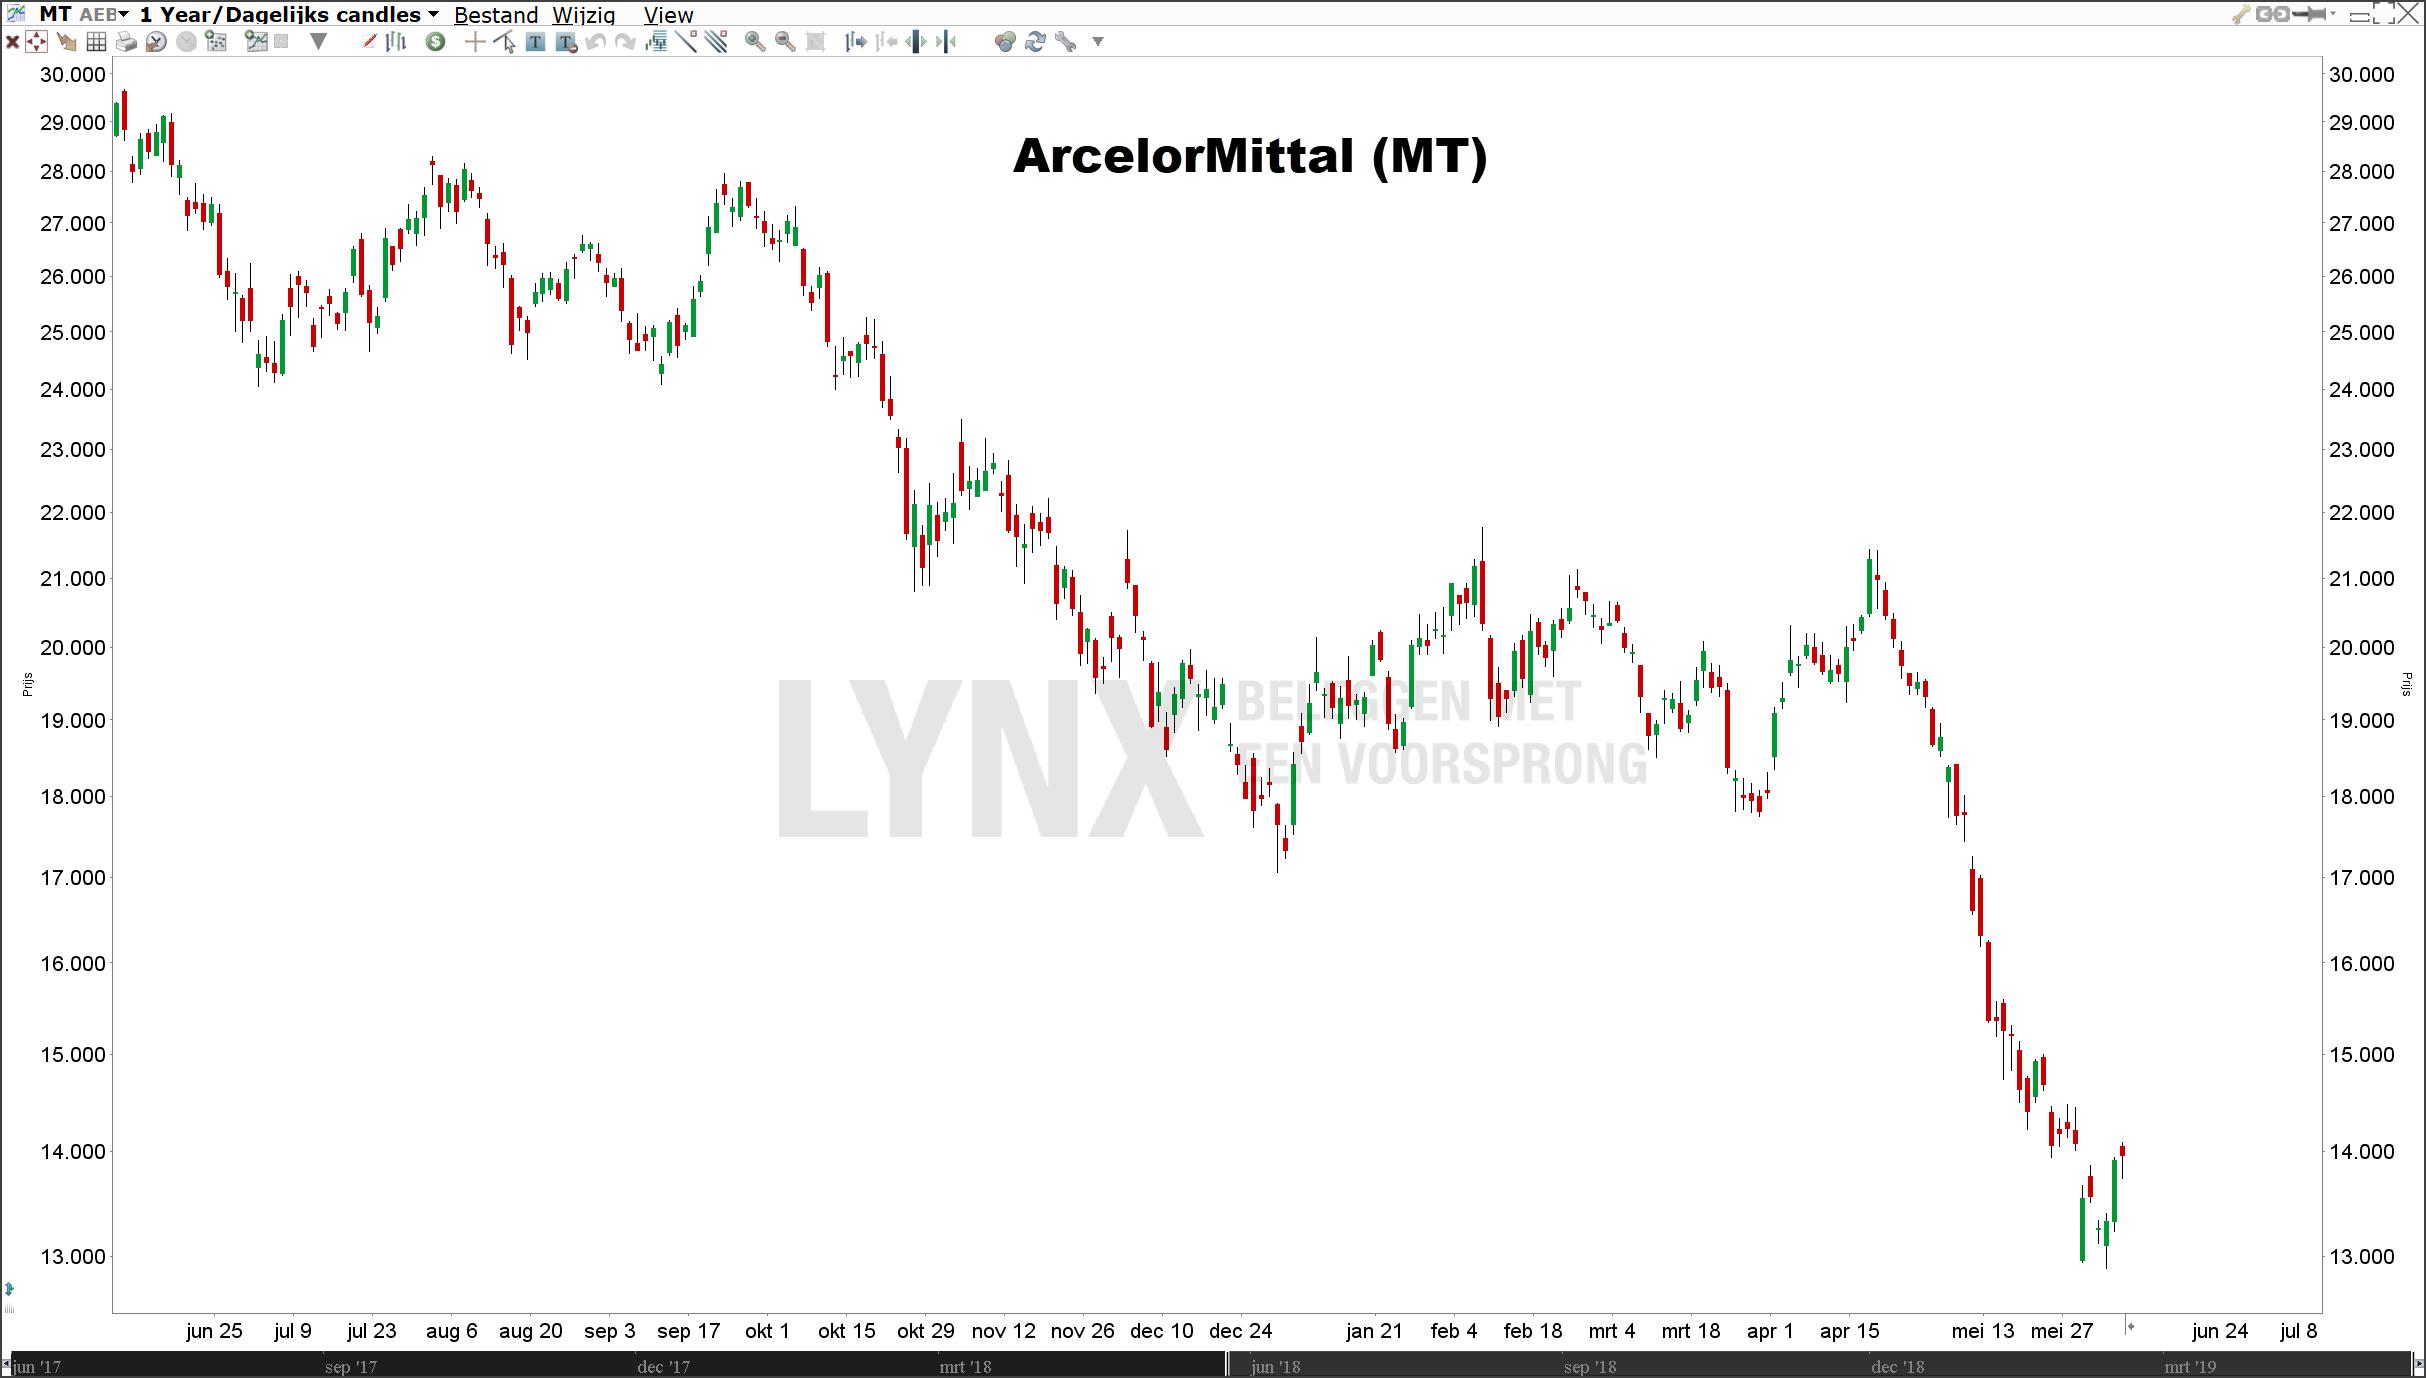 Koers aandeel ArcelorMittal (MT) zakt weg